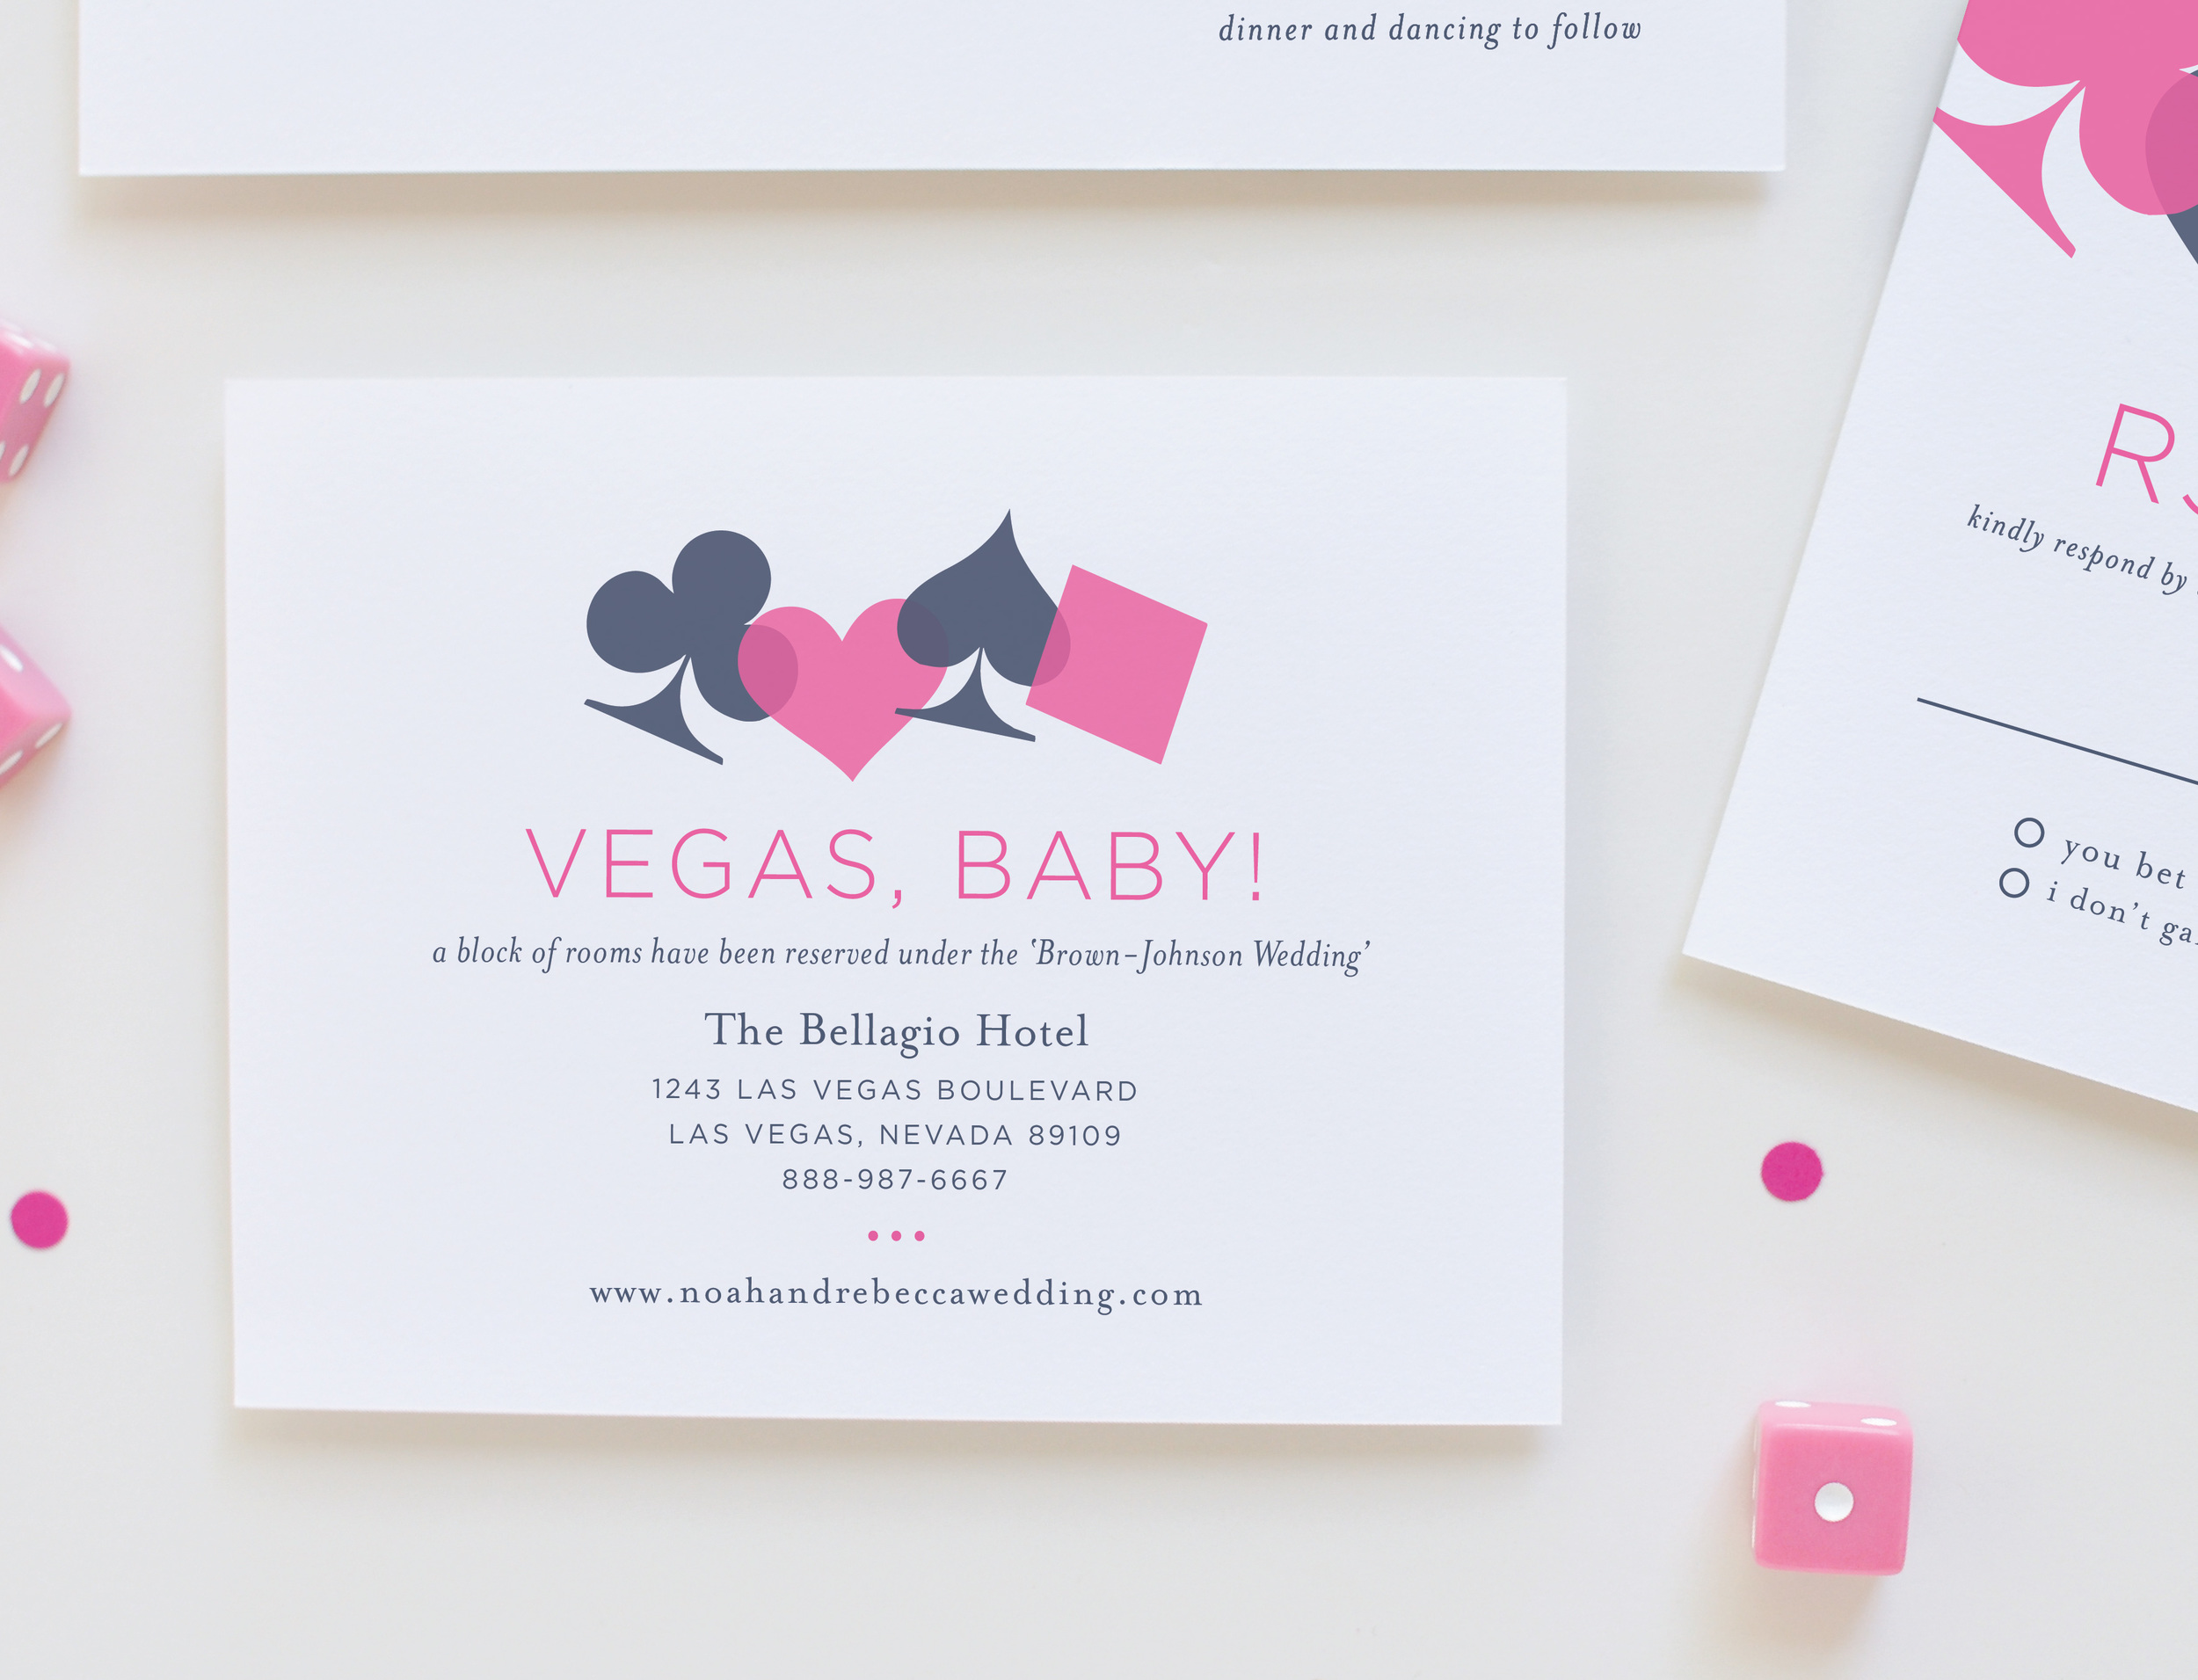 Vegas_Casino Wedding Invitation4-01.jpg